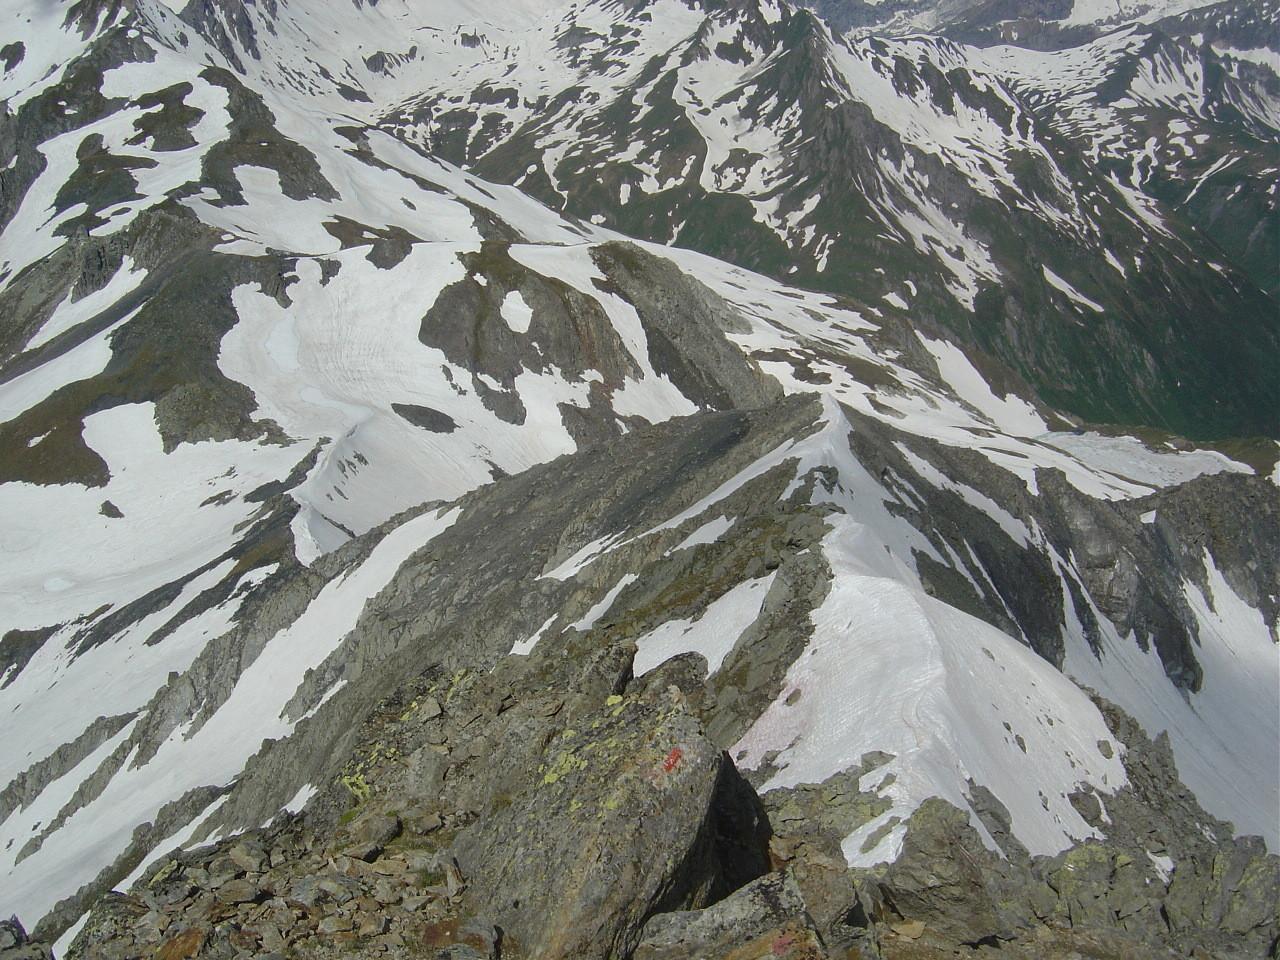 L'arête W vue du sommet